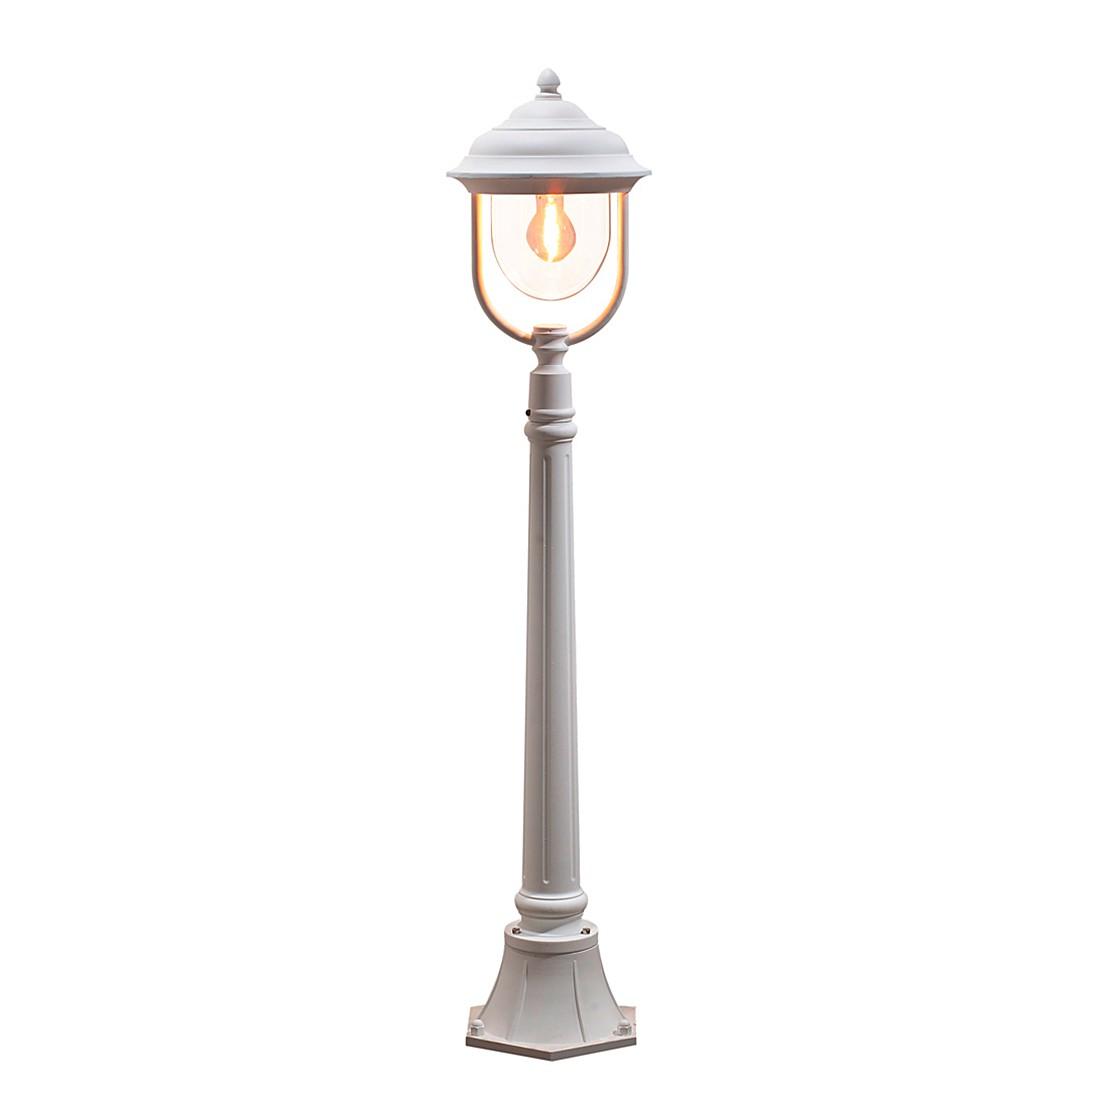 Wegeleuchte Parma ● Aluminium/Glas ● 1-flammig- Konstsmide A++